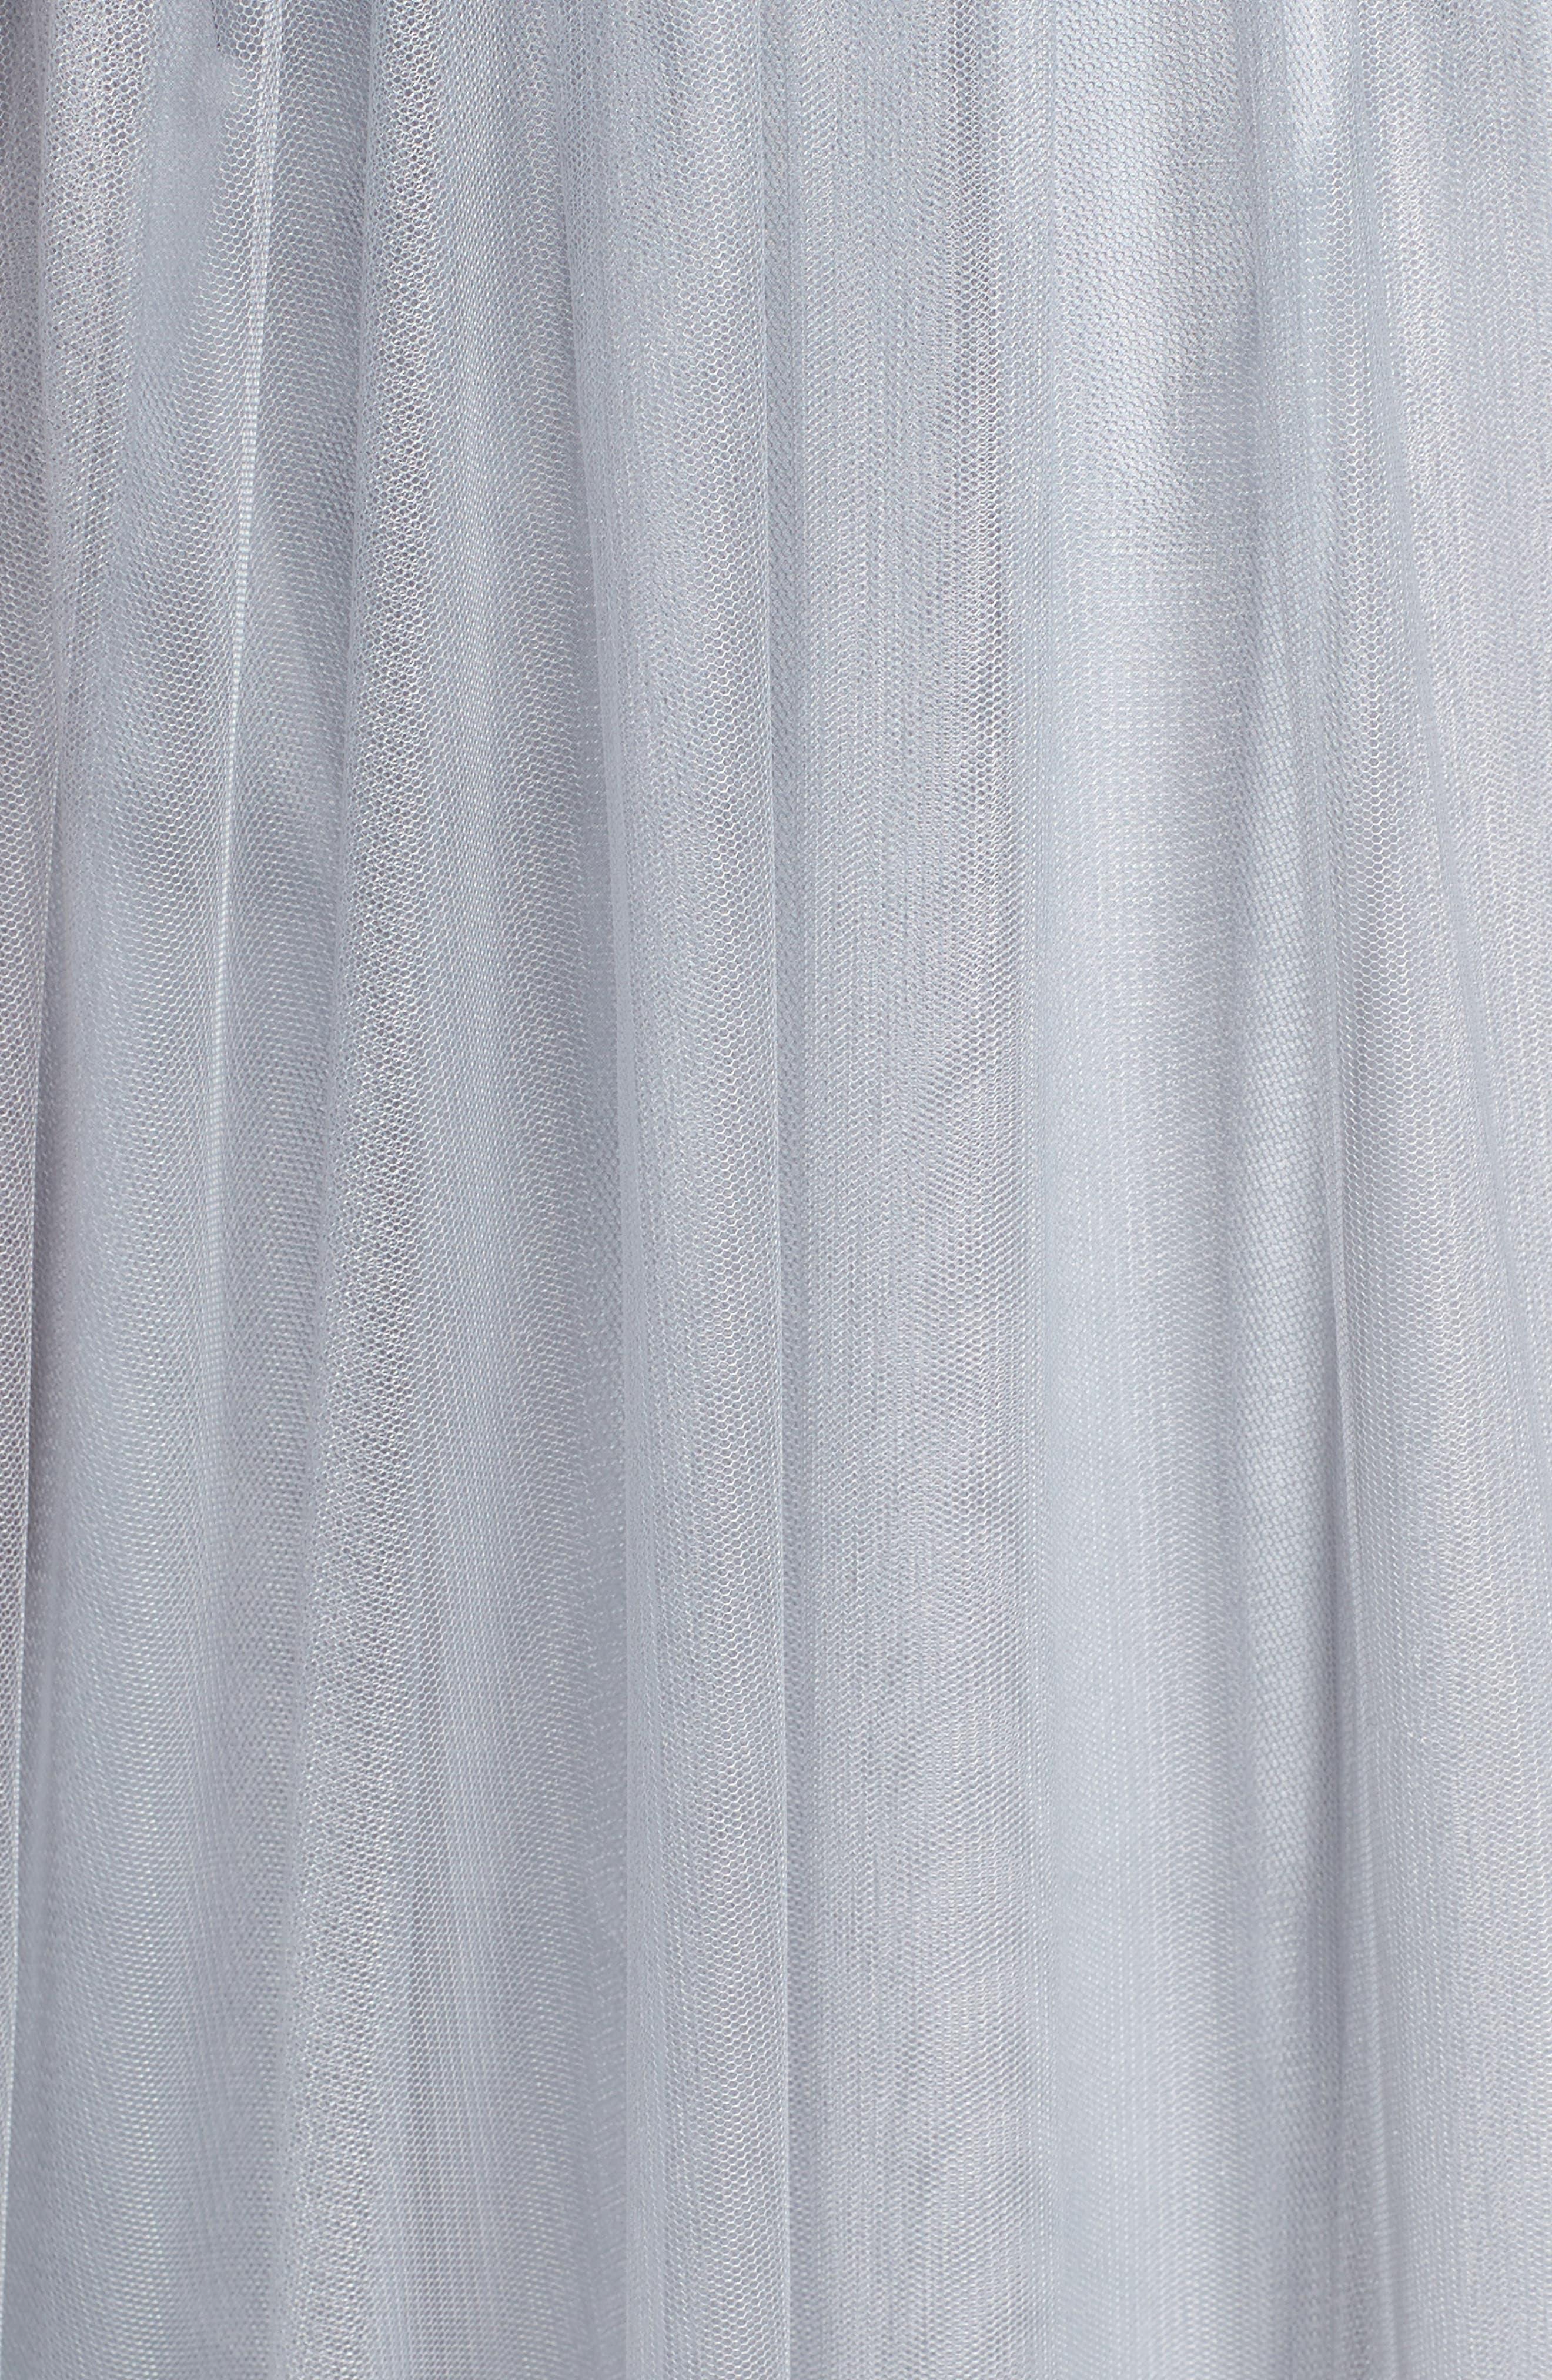 Illusion Gown,                             Alternate thumbnail 5, color,                             020